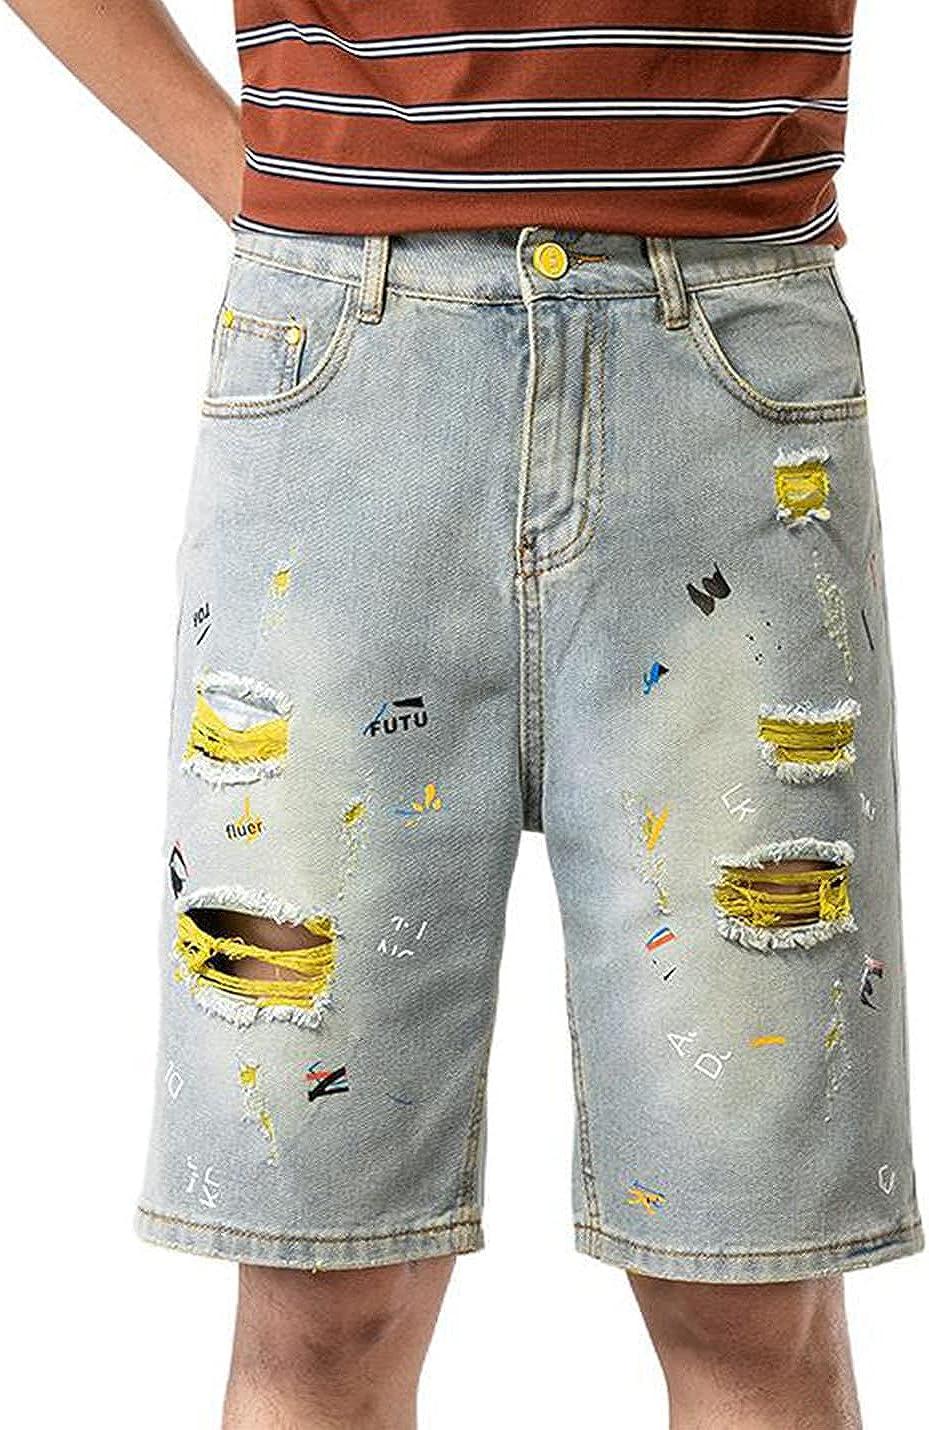 PAODIKUAI Men Ripped Distrssed Jean Shorts Skinny Denim Shorts with Broken Hole